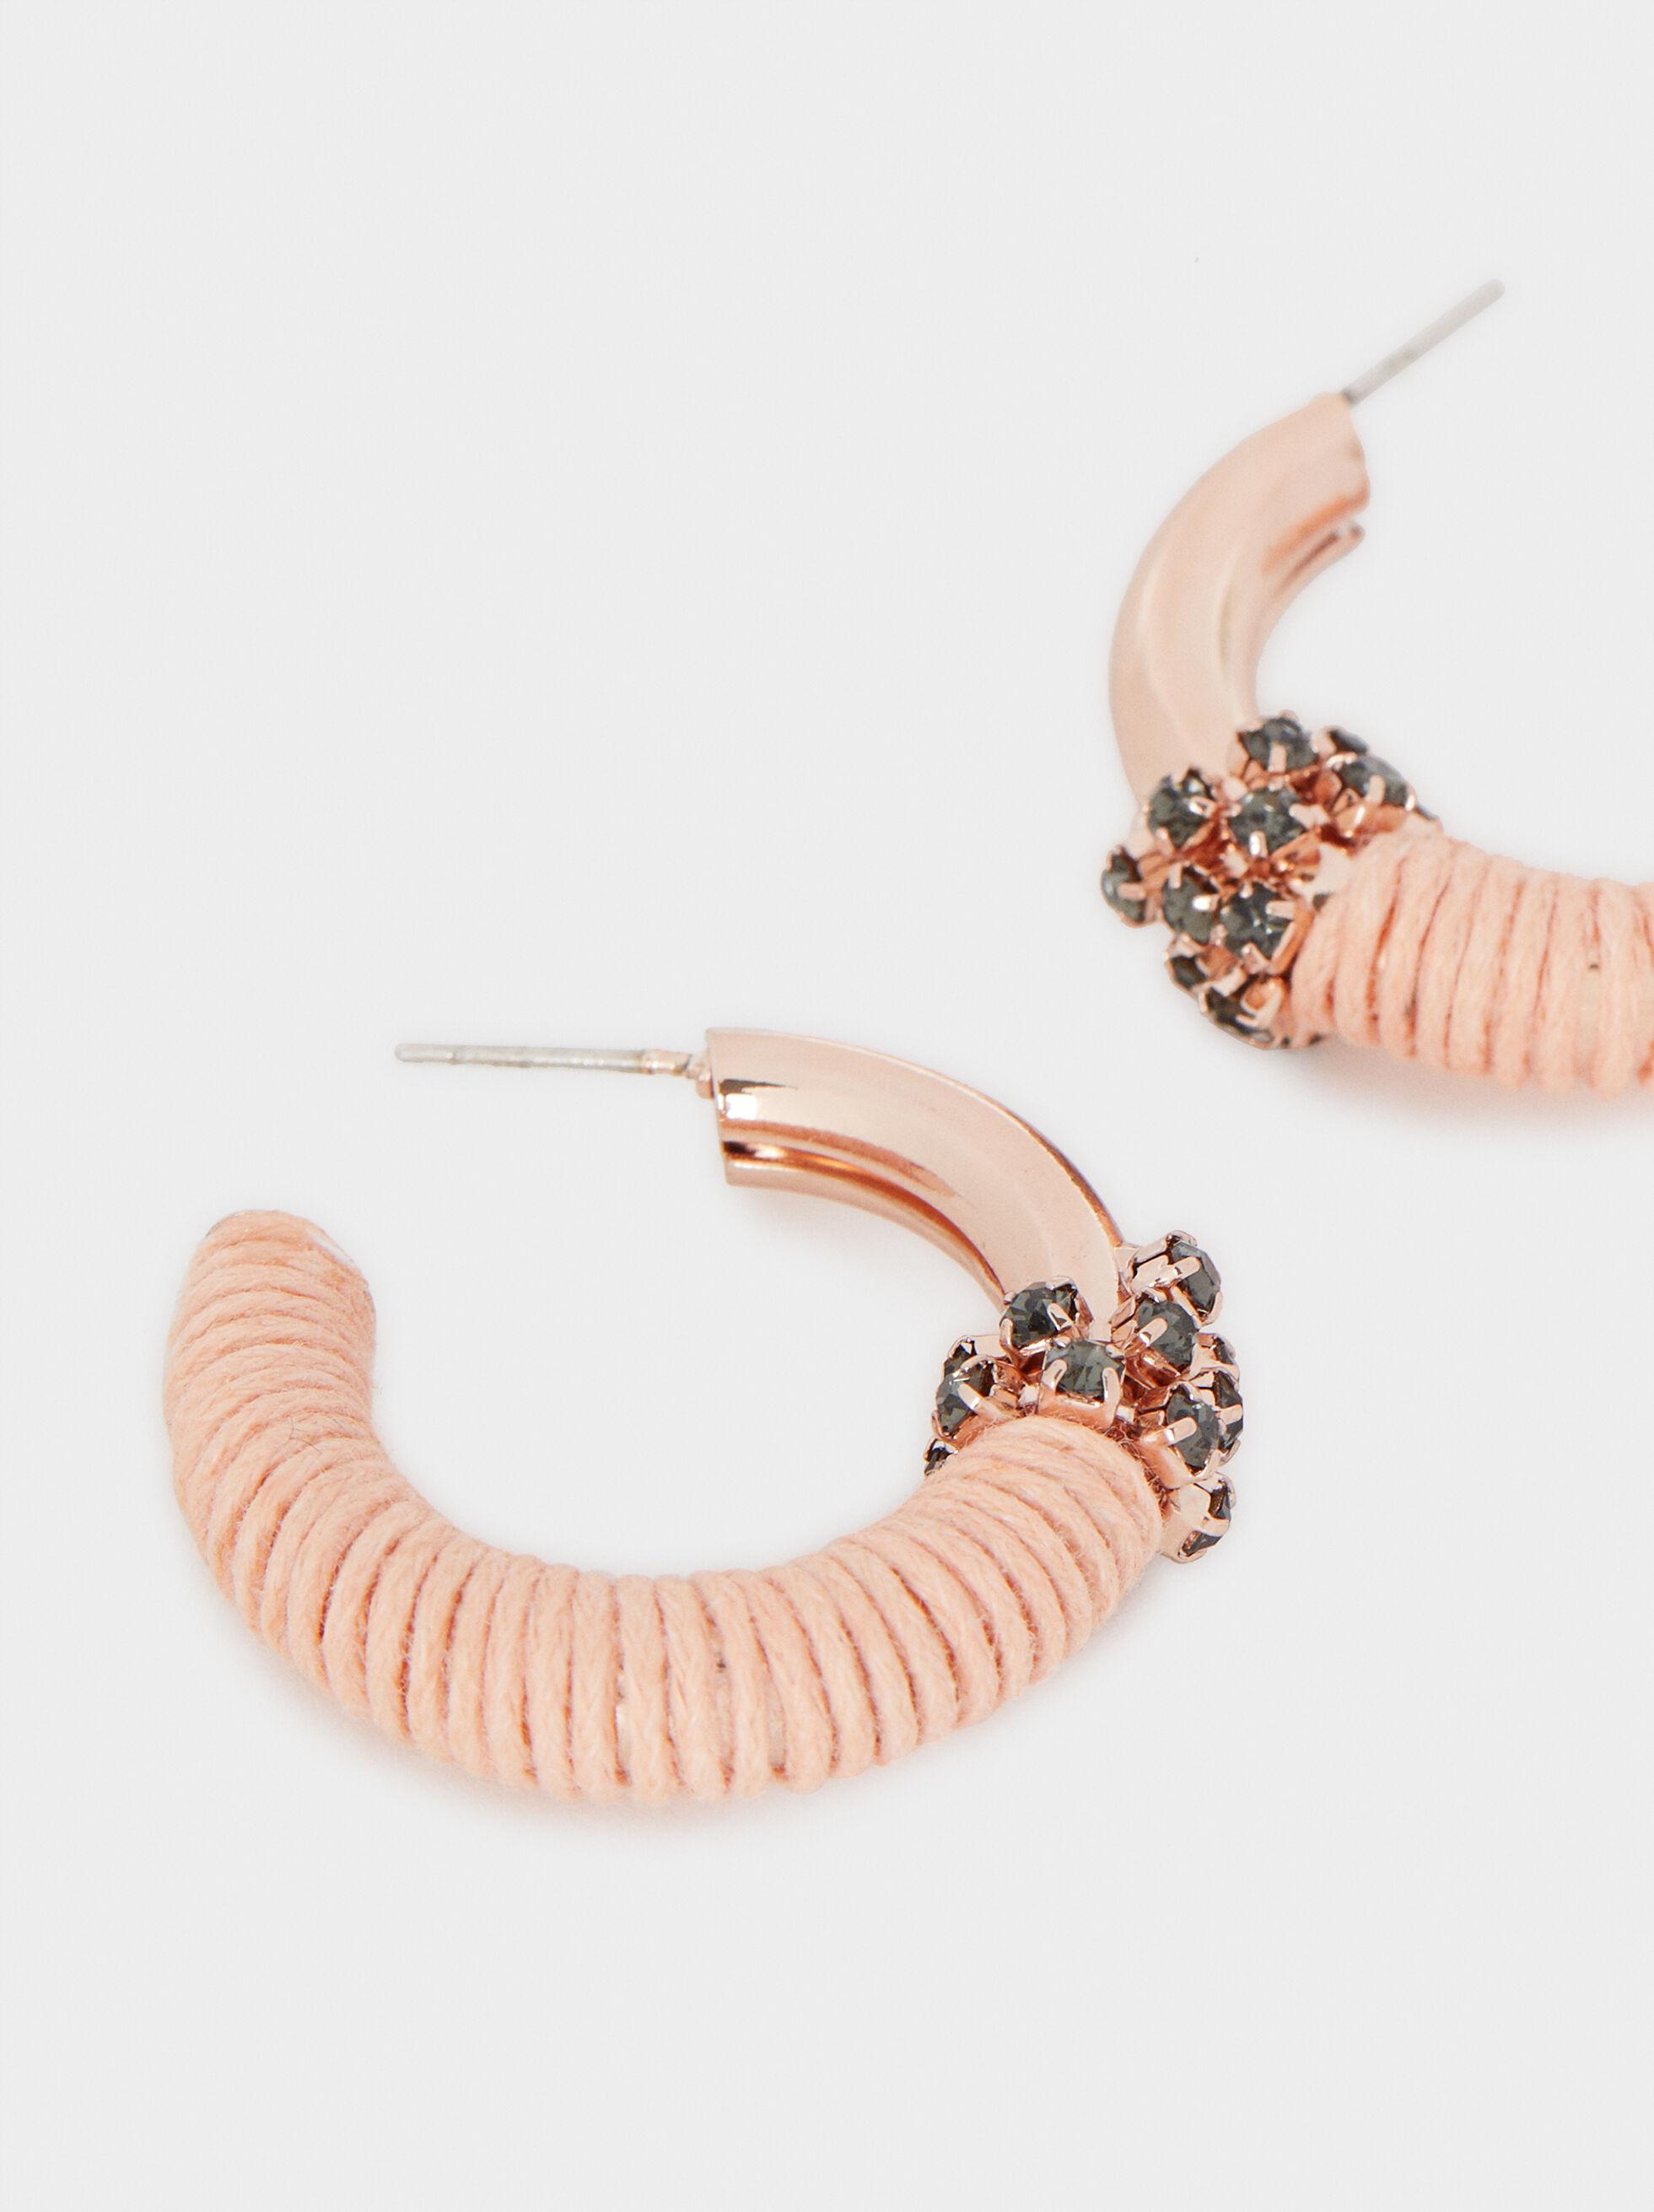 Rose Gold Small Hoop Earrings With Crystal Detail, Orange, hi-res